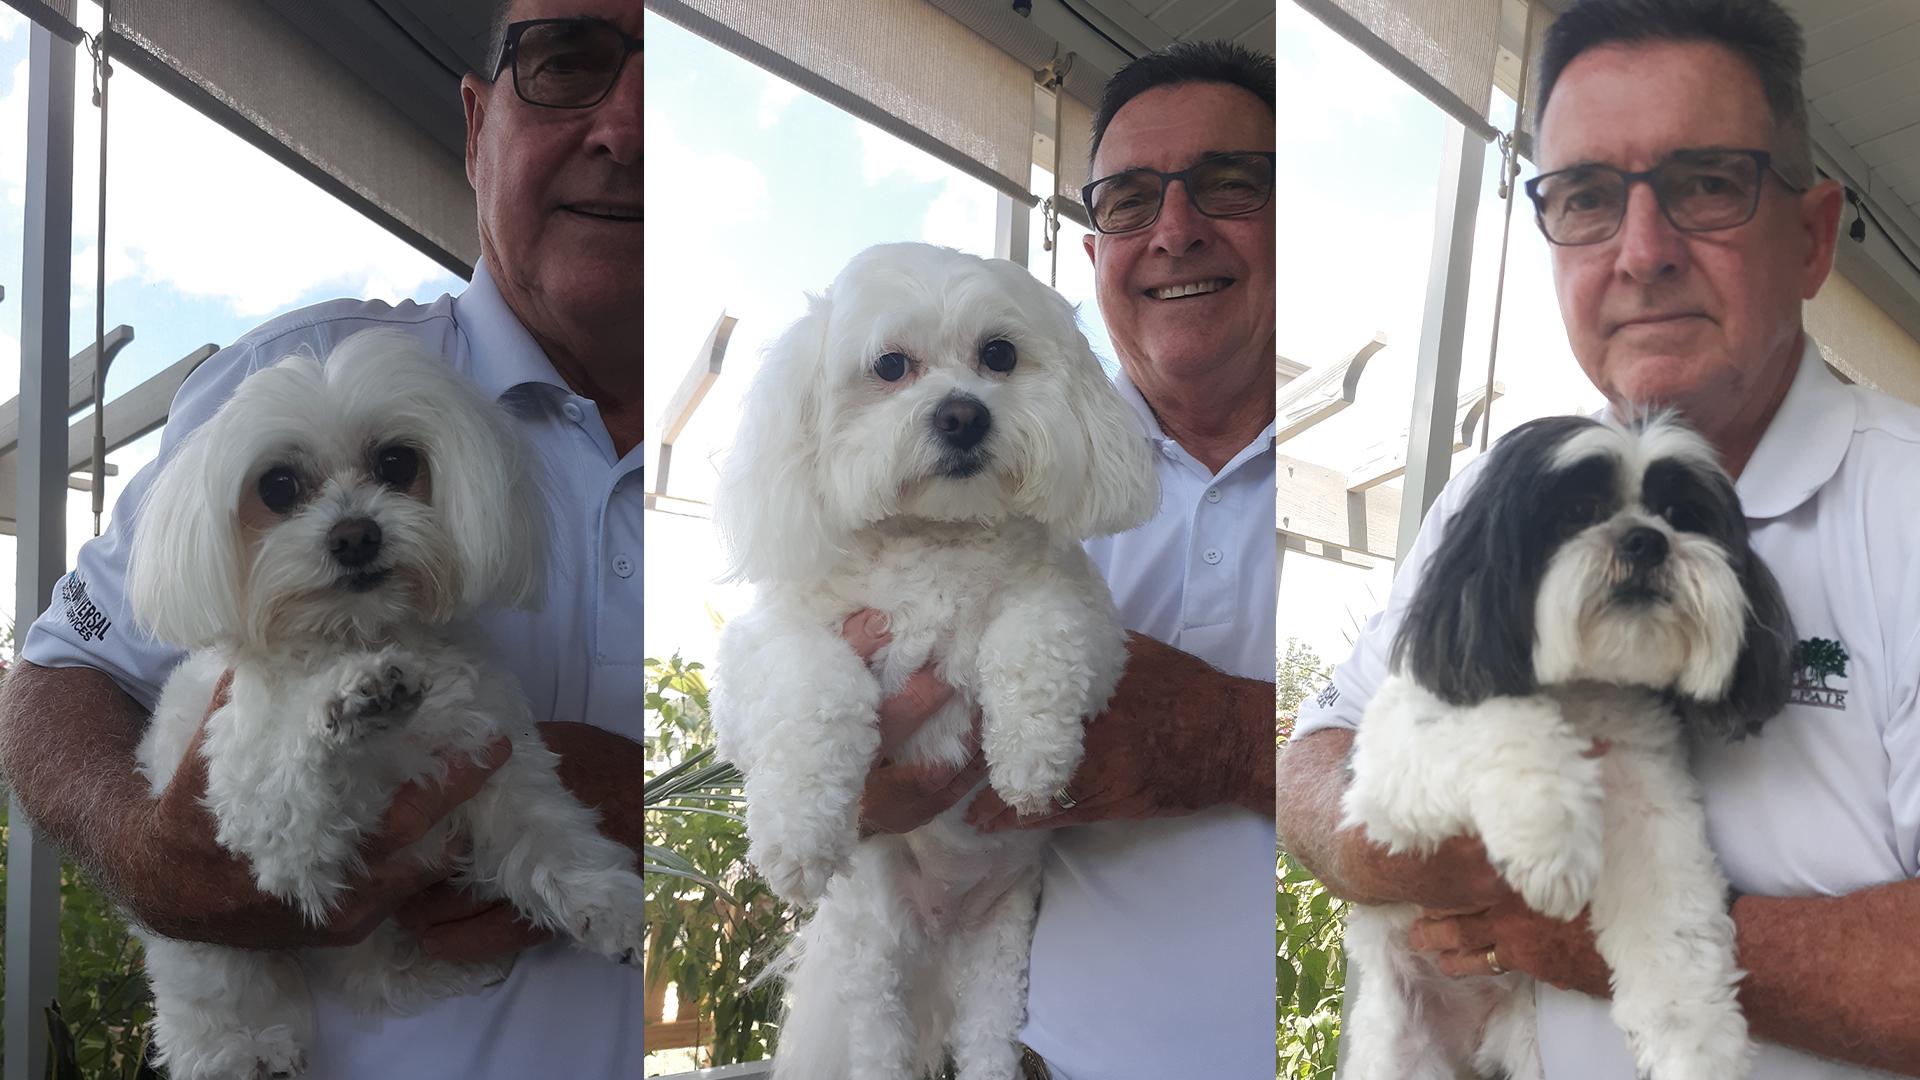 GALLERY: WSAV viewers share pet rescue stories | WSAV-TV